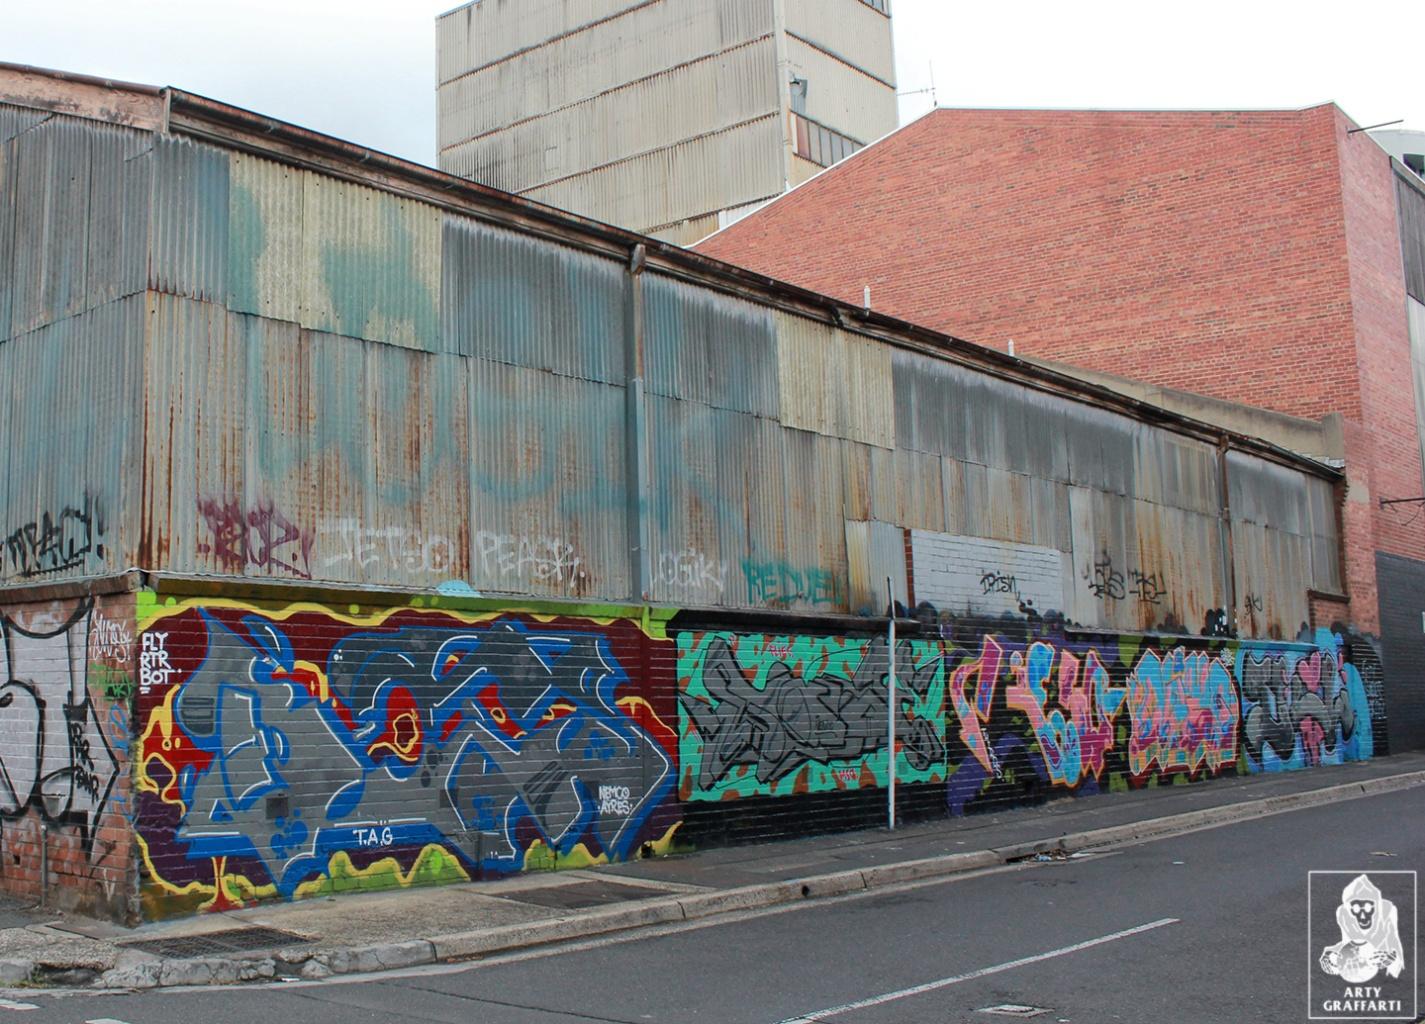 Ikool-Ouzo-Keno-Sage-Bolts-Collingwood-Graffiti-Melbourne-Arty-Graffarti